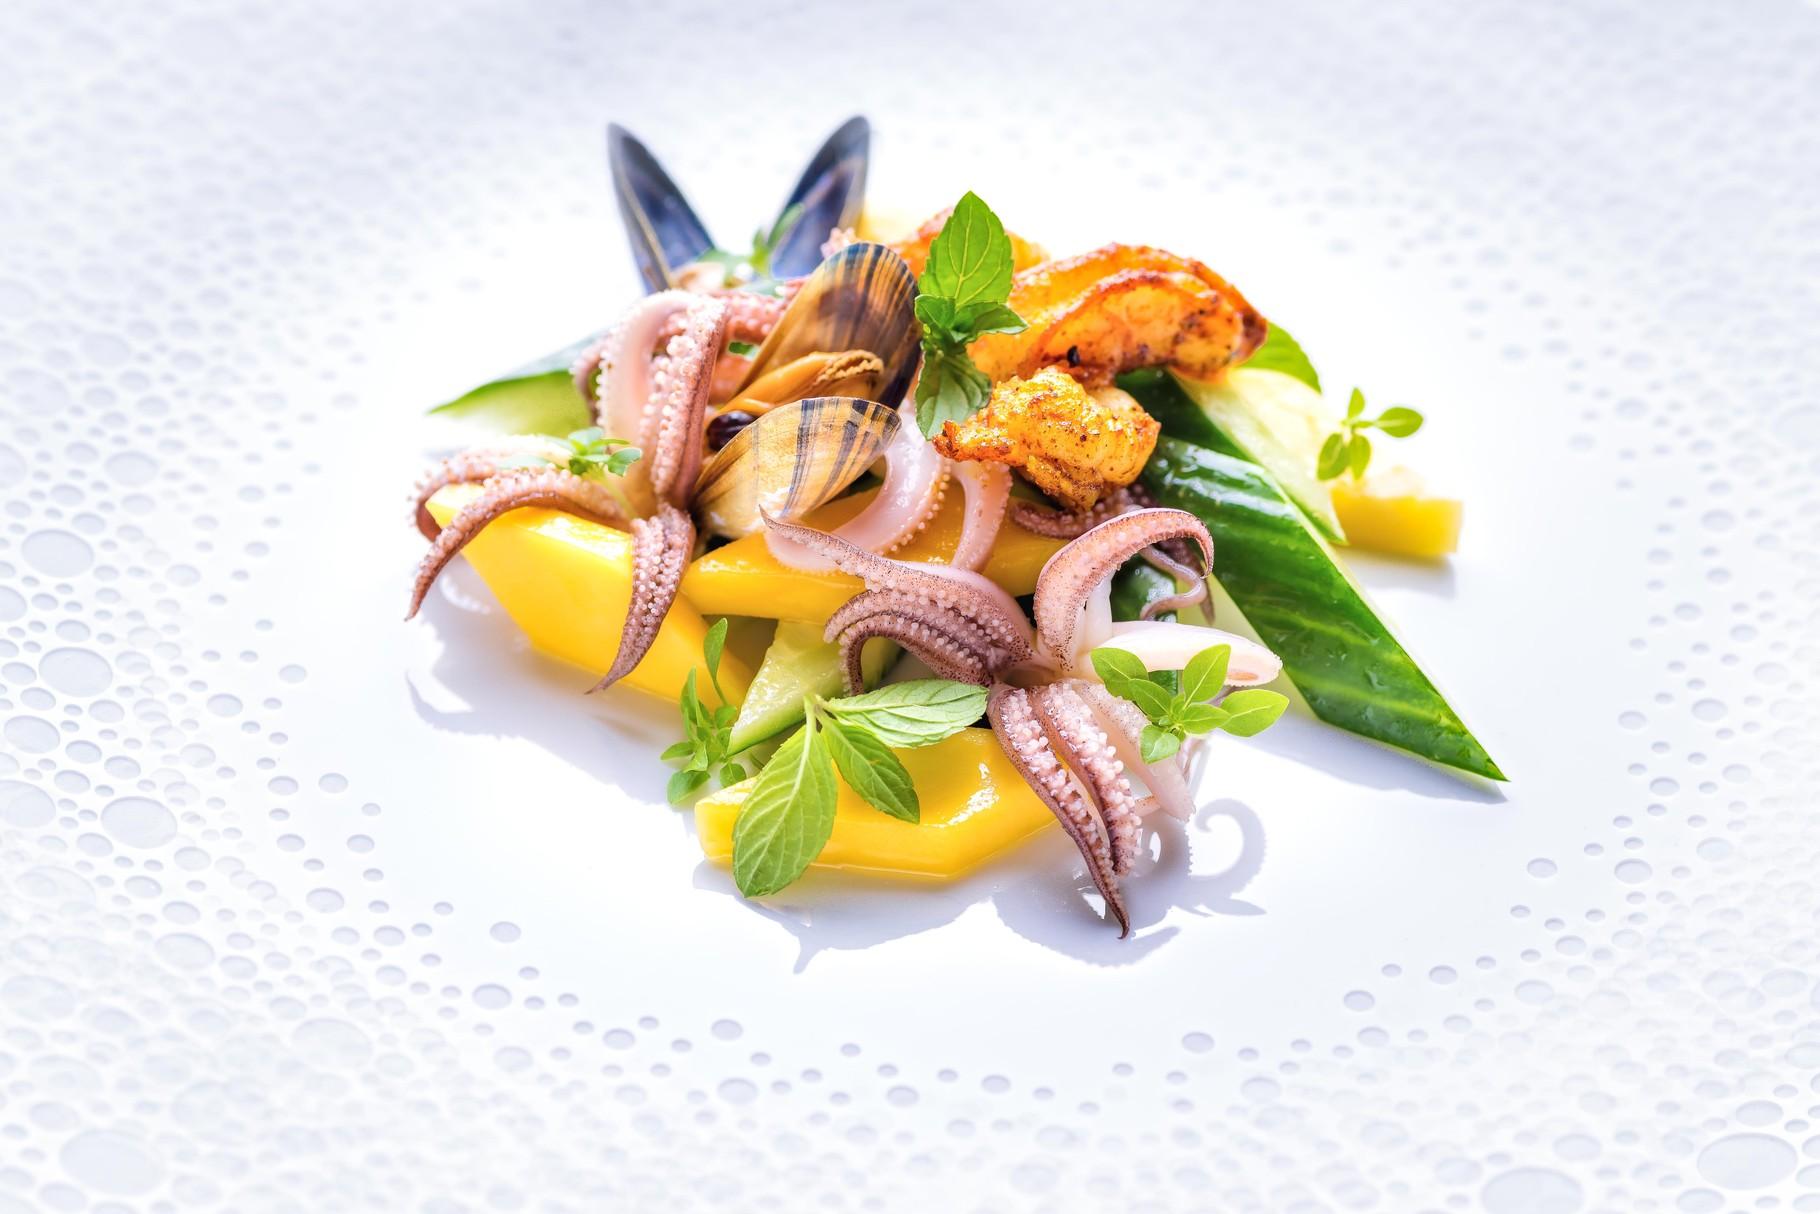 Food-Fotografie Seafood